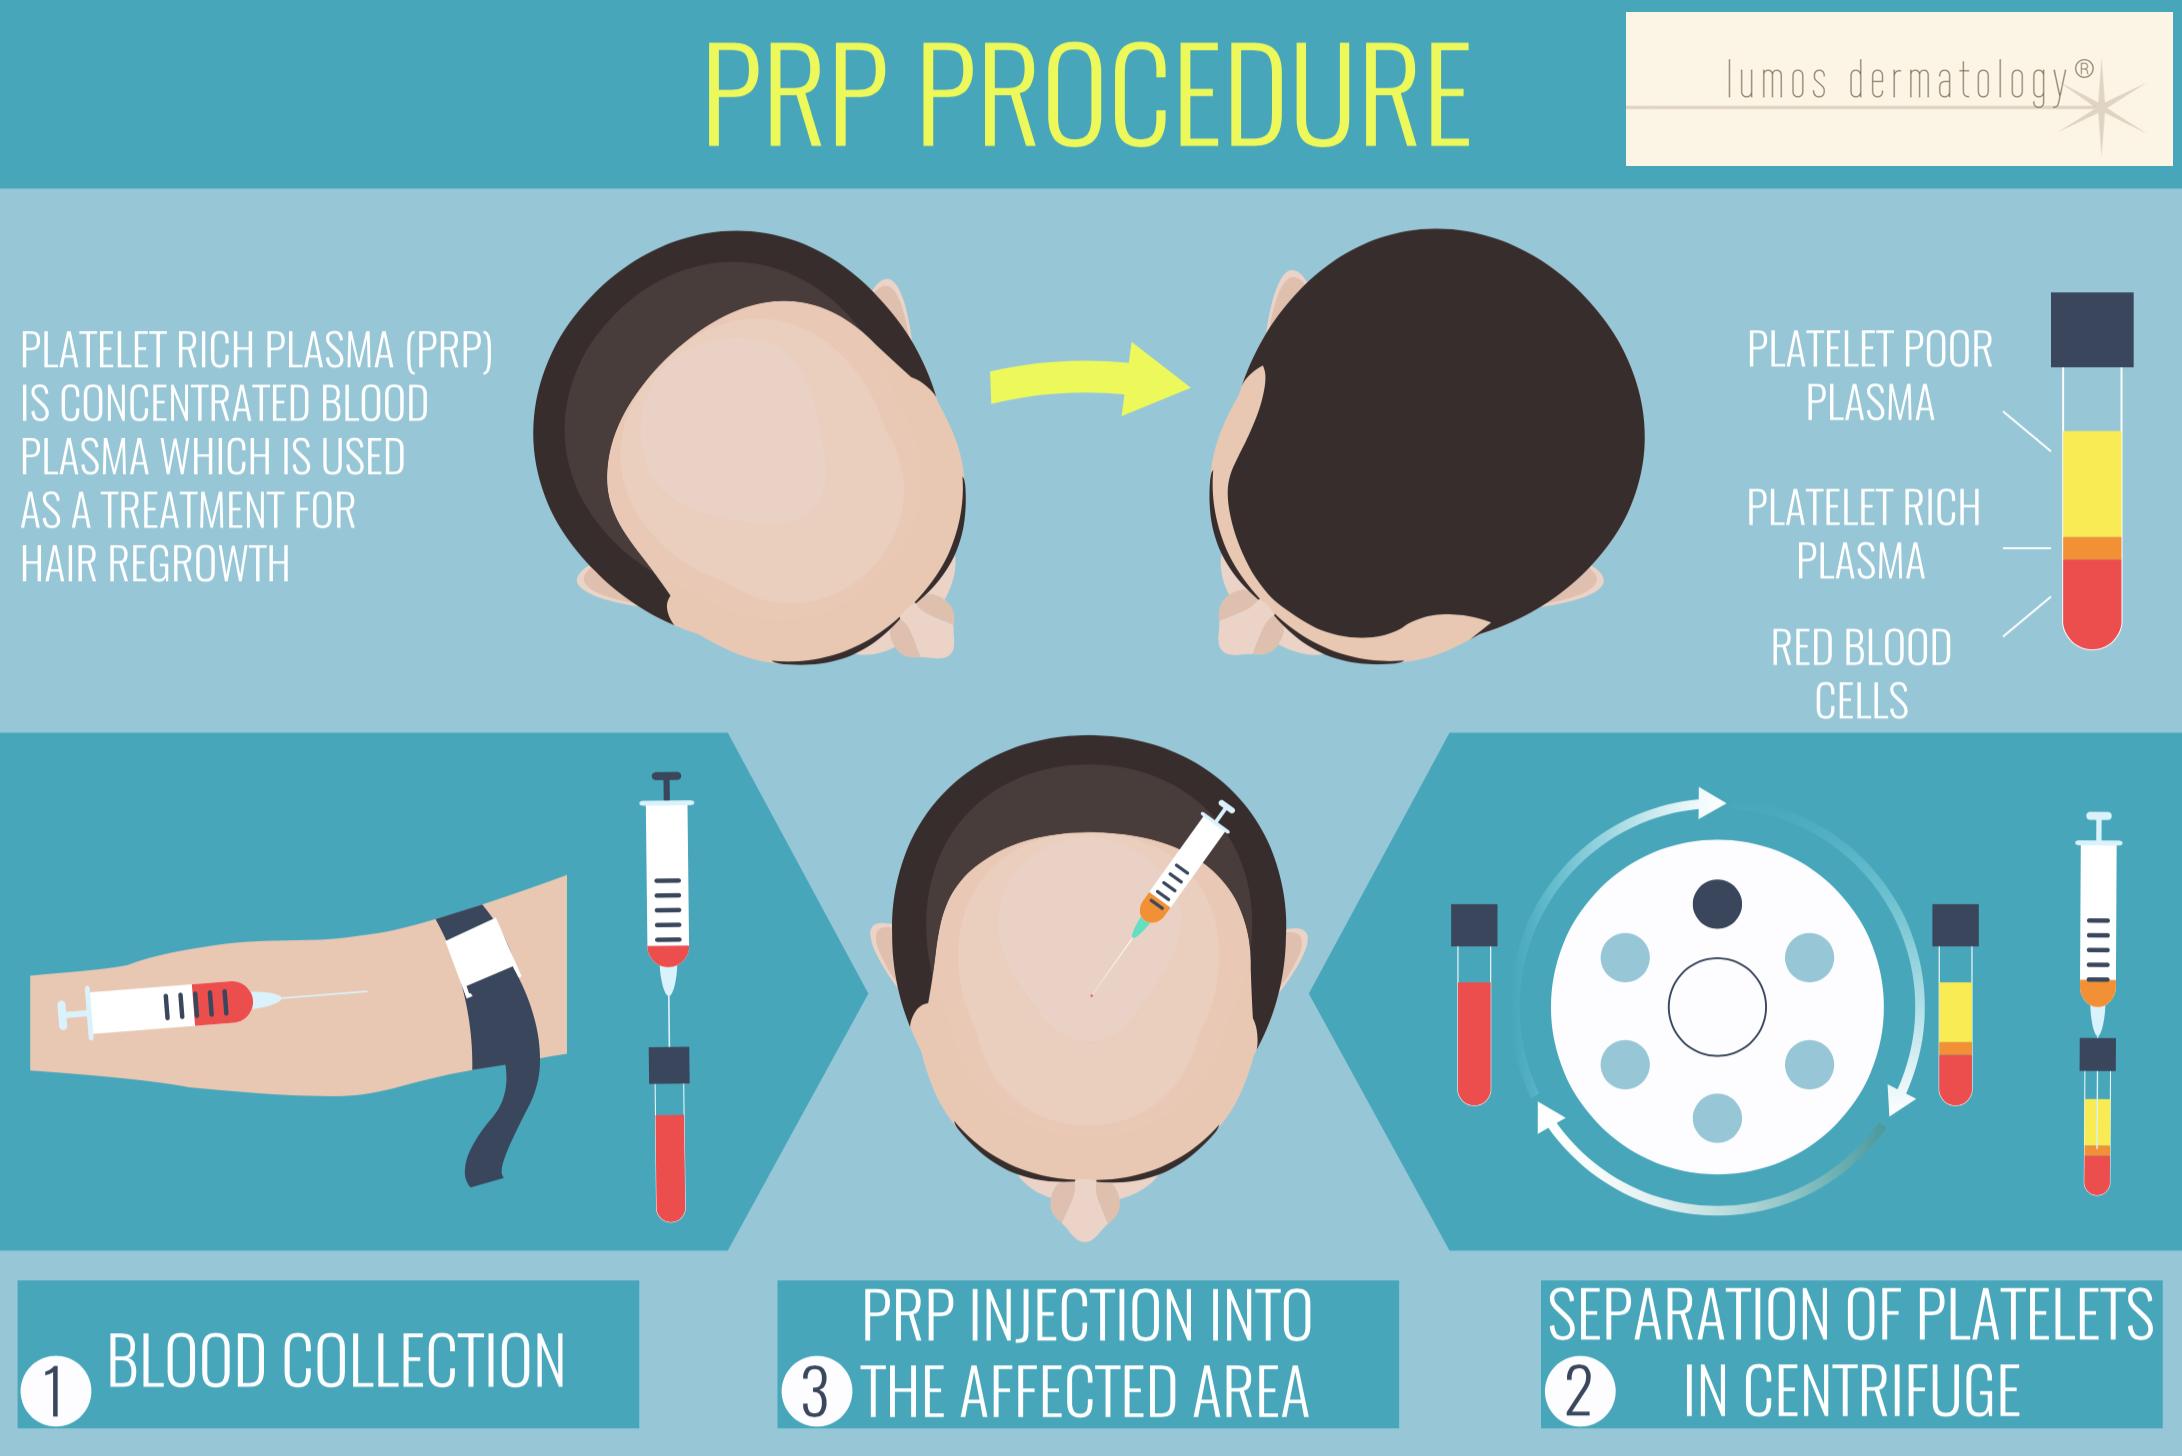 PRP procedure lumos dermatology.png